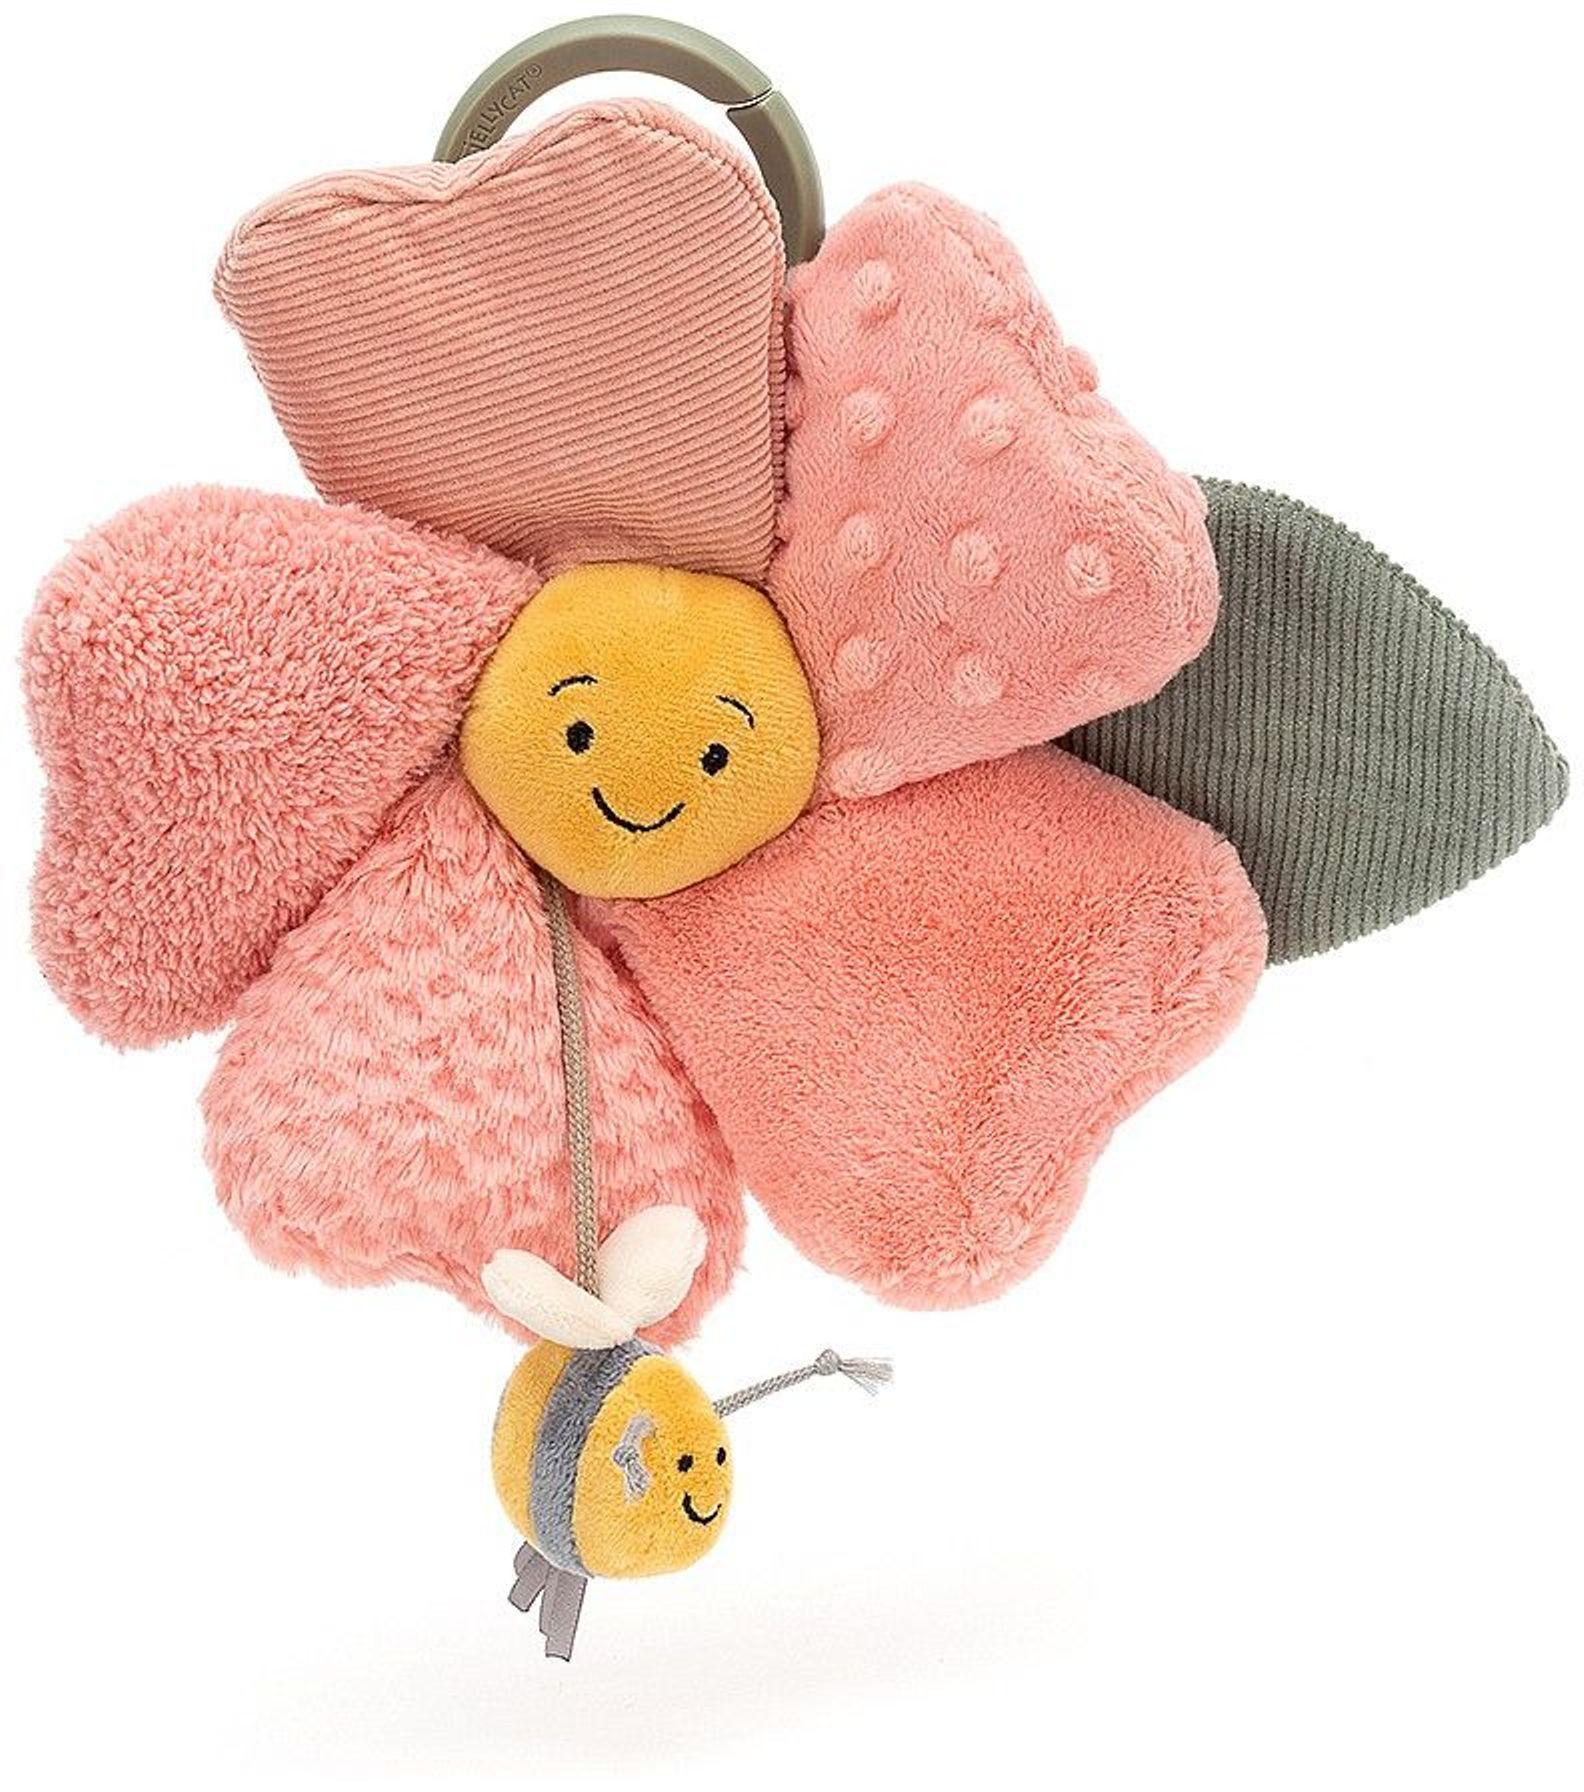 Jellycat Activity Toy Fleury Petunia 20 x 20 cm